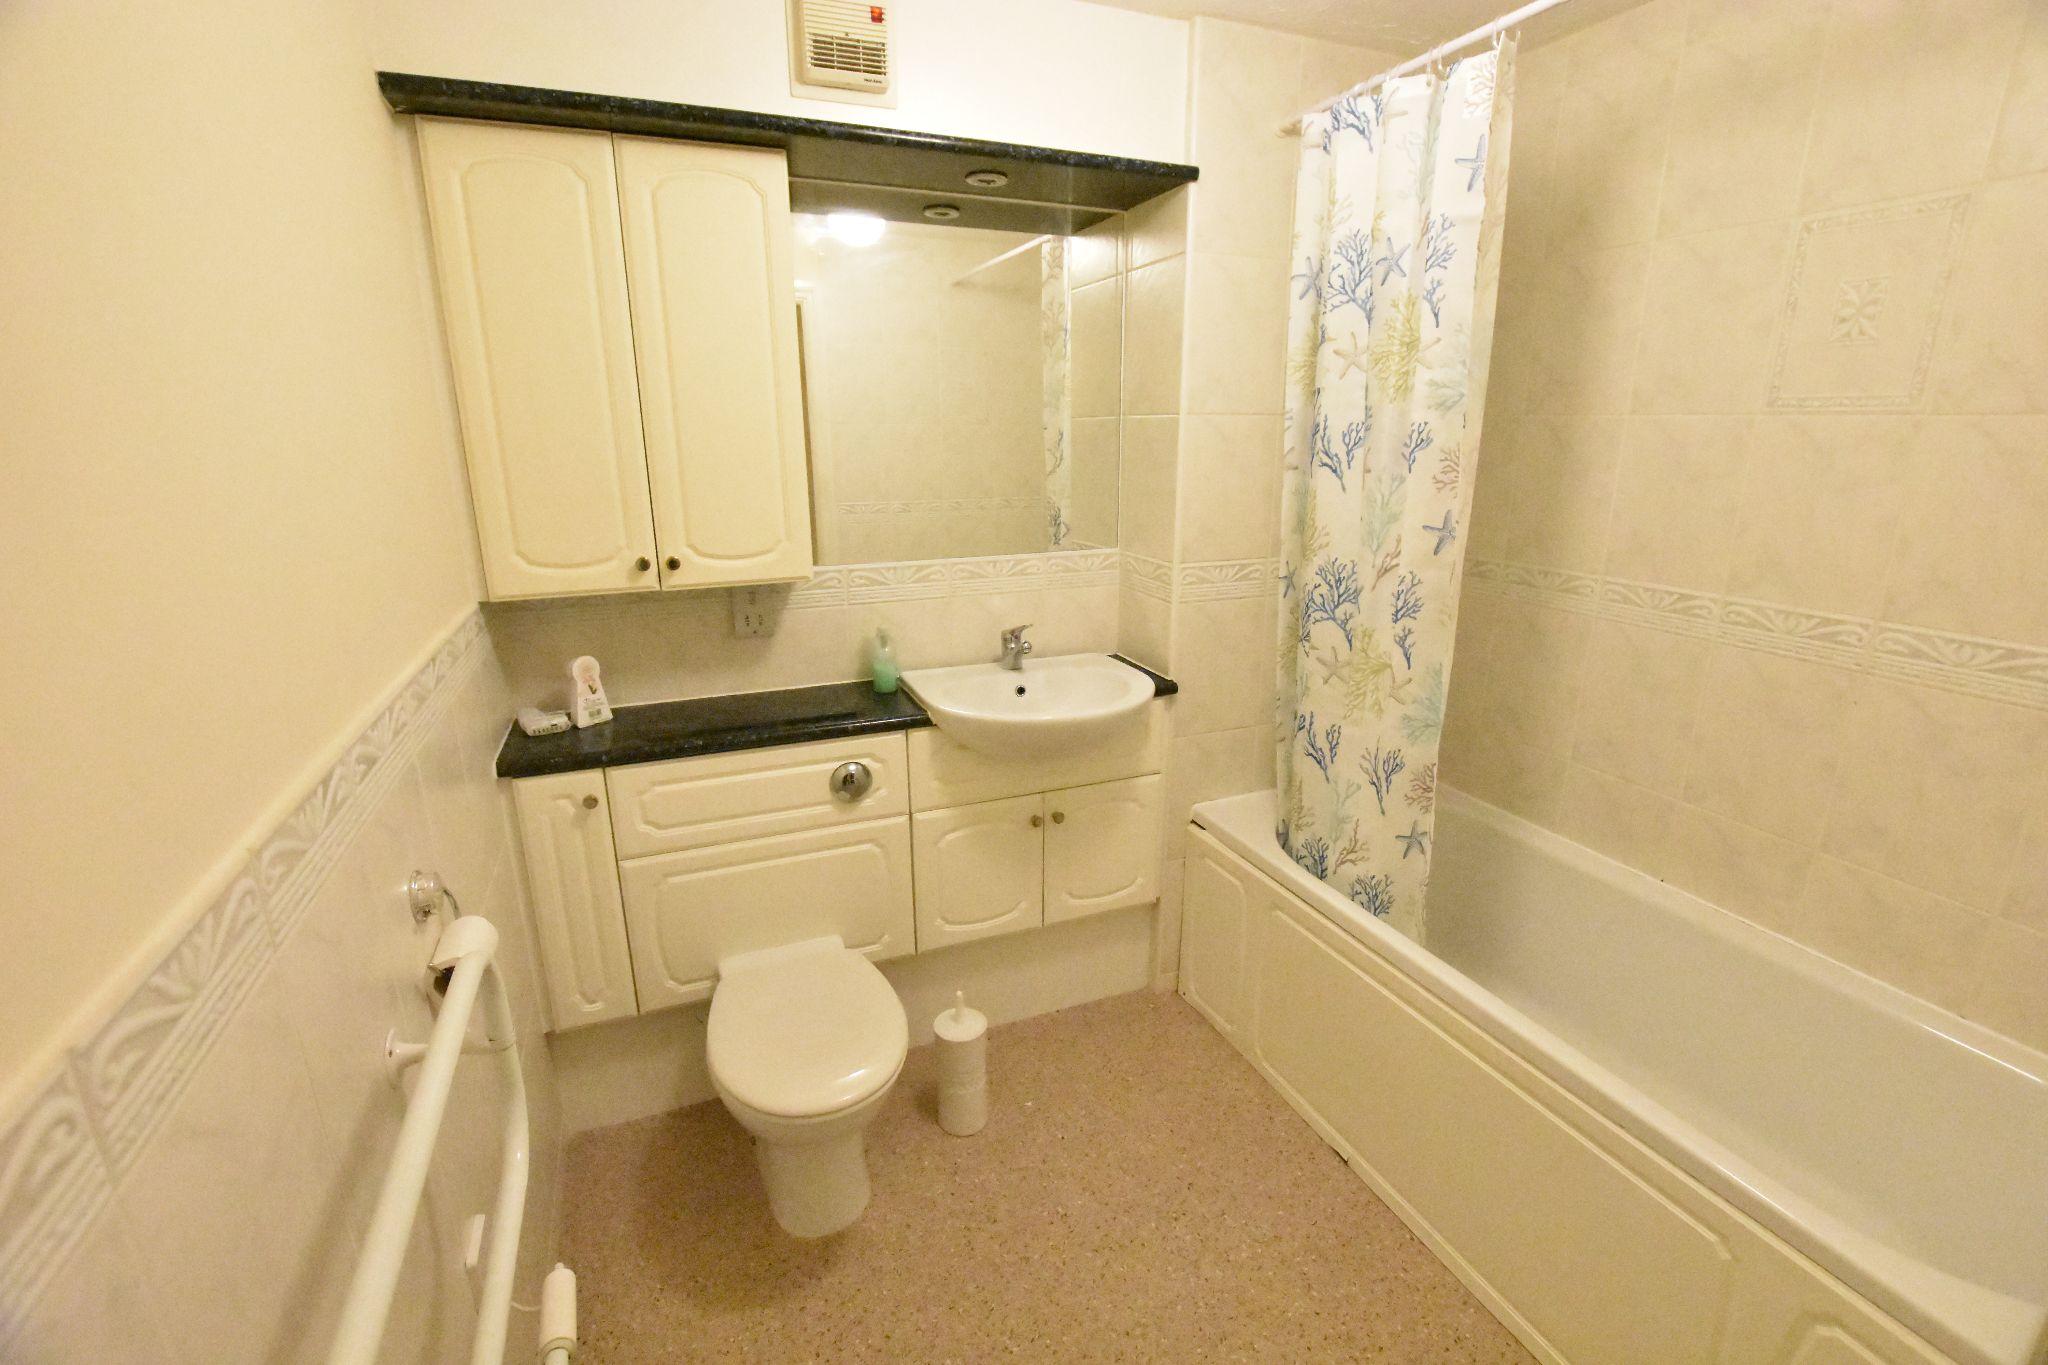 2 bedroom apartment flat/apartment Sold STC in Preston - Bathroom